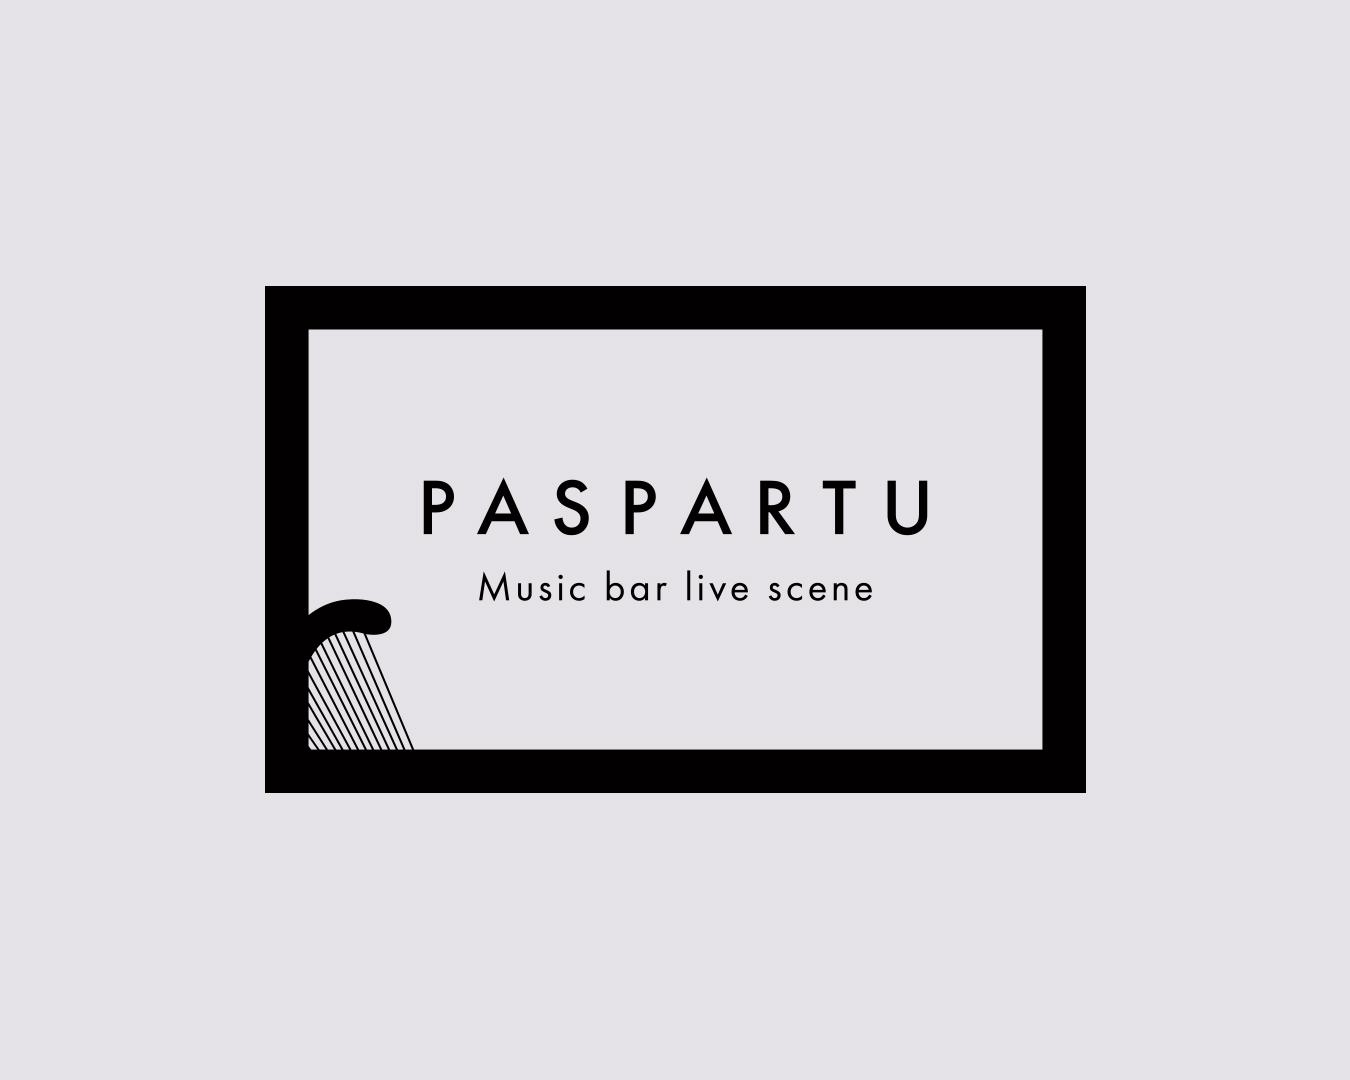 Paspartu music bar live scene